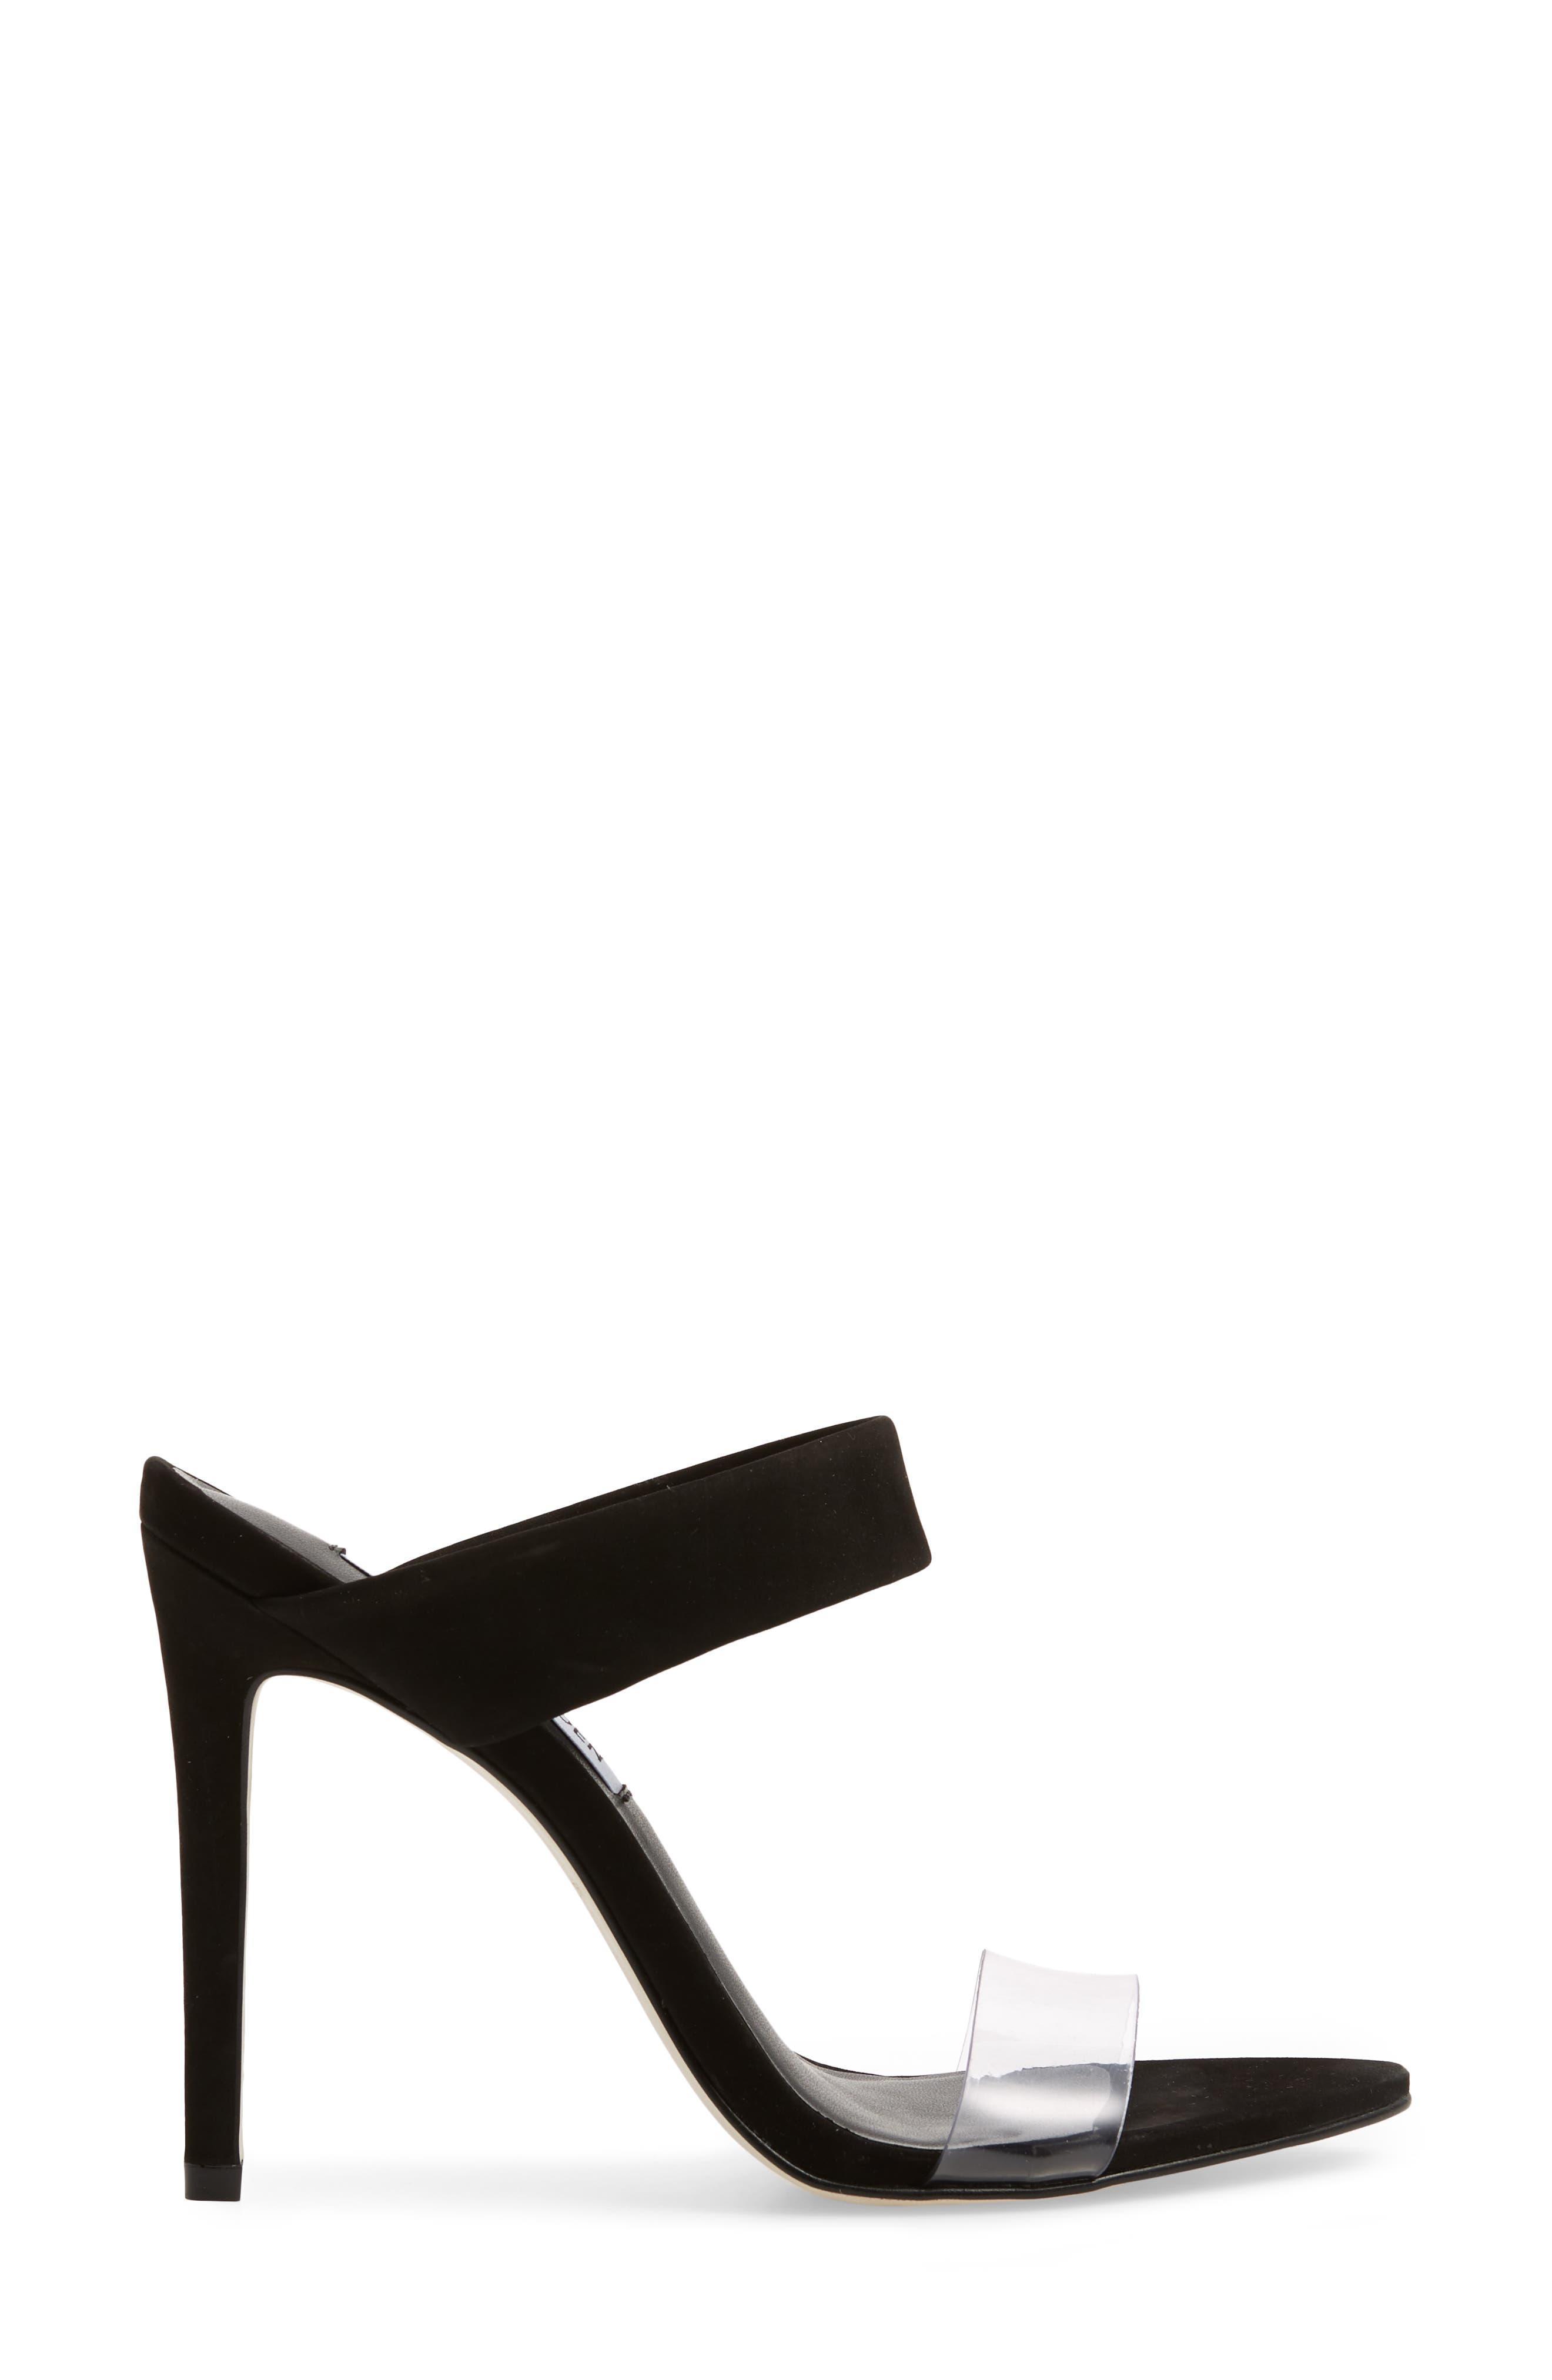 STEVE MADDEN, Amaya Clear Slide Sandal, Alternate thumbnail 3, color, BLACK NUBUCK LEATHER